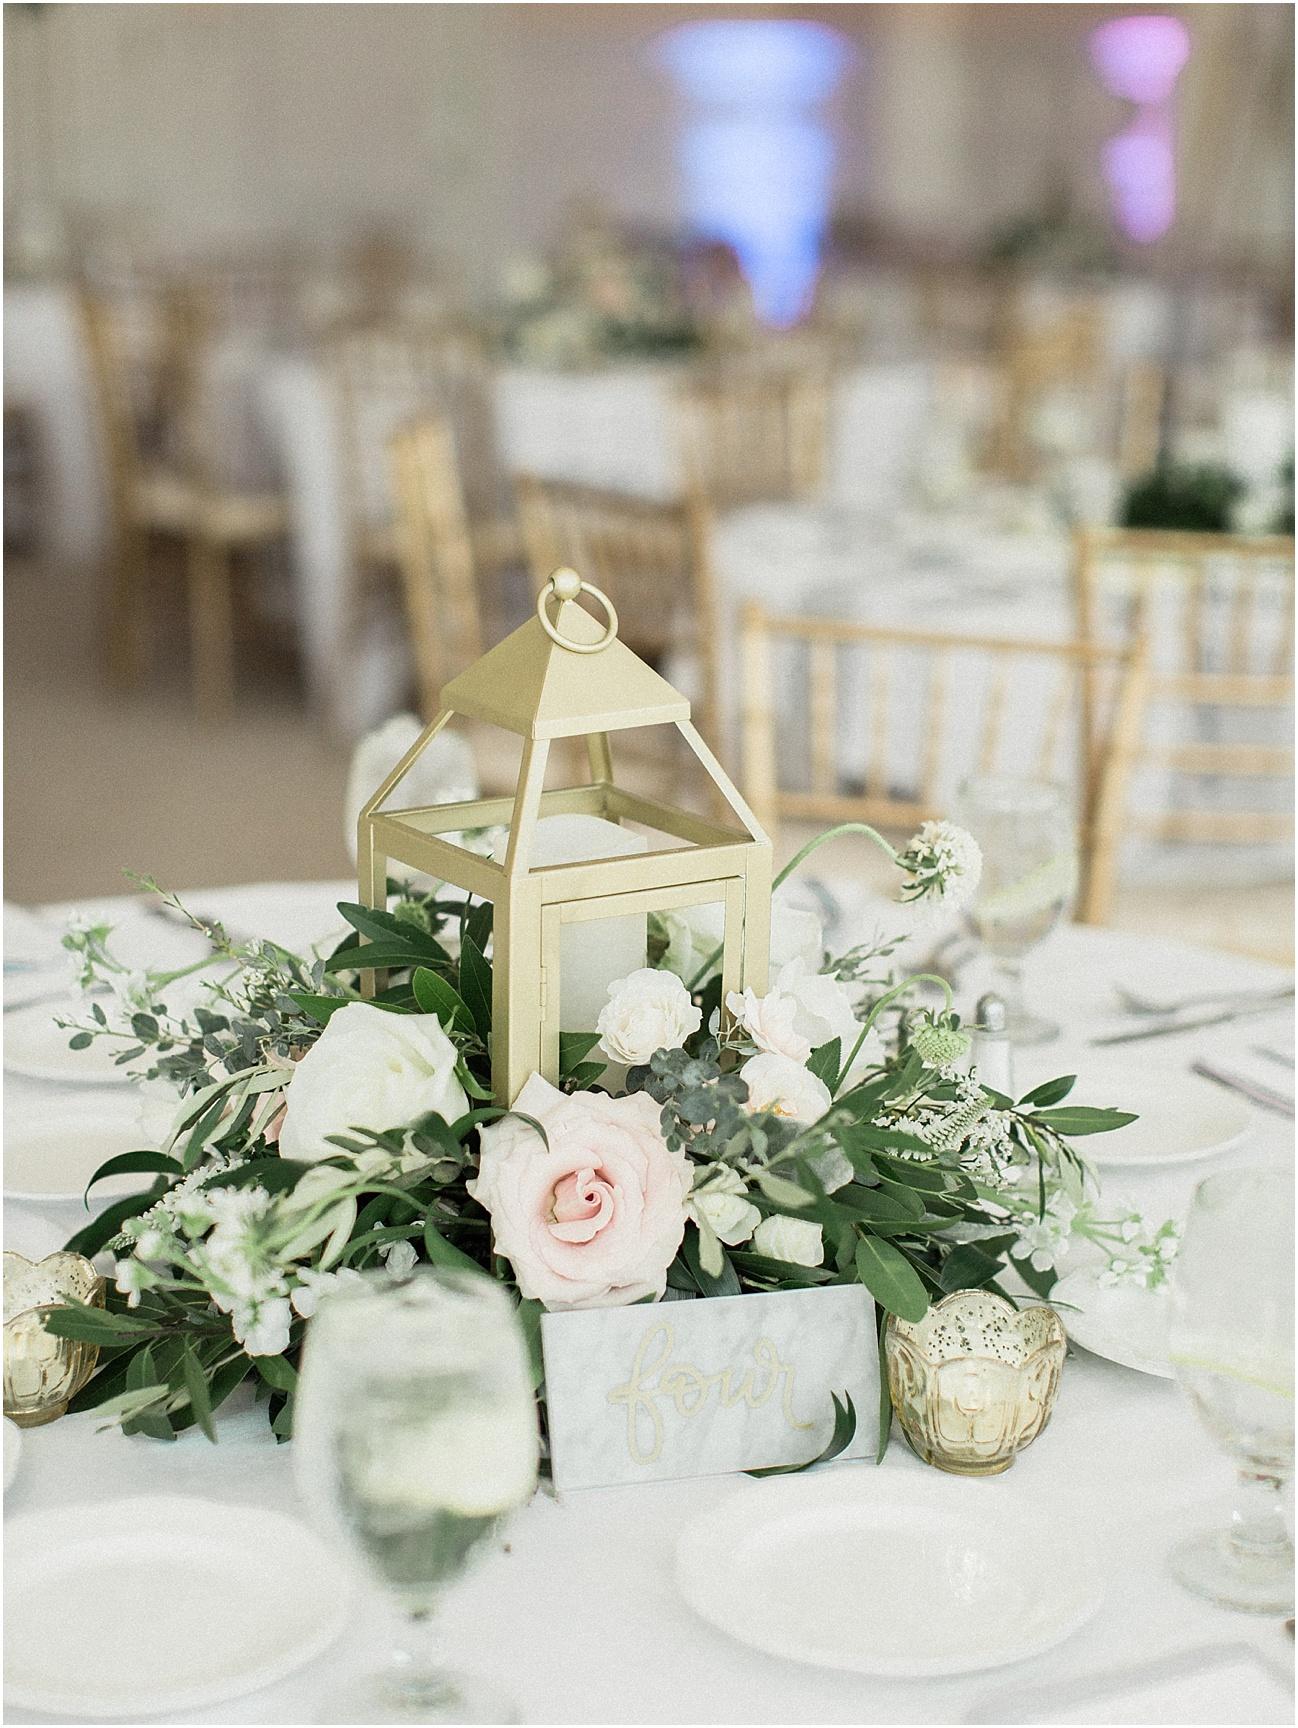 lindsey_paul_indian_pond_country_club_wild_dahlia_brewster_gardens_plymouth_cape_cod_boston_wedding_photographer_meredith_jane_photography_photo_0391.jpg